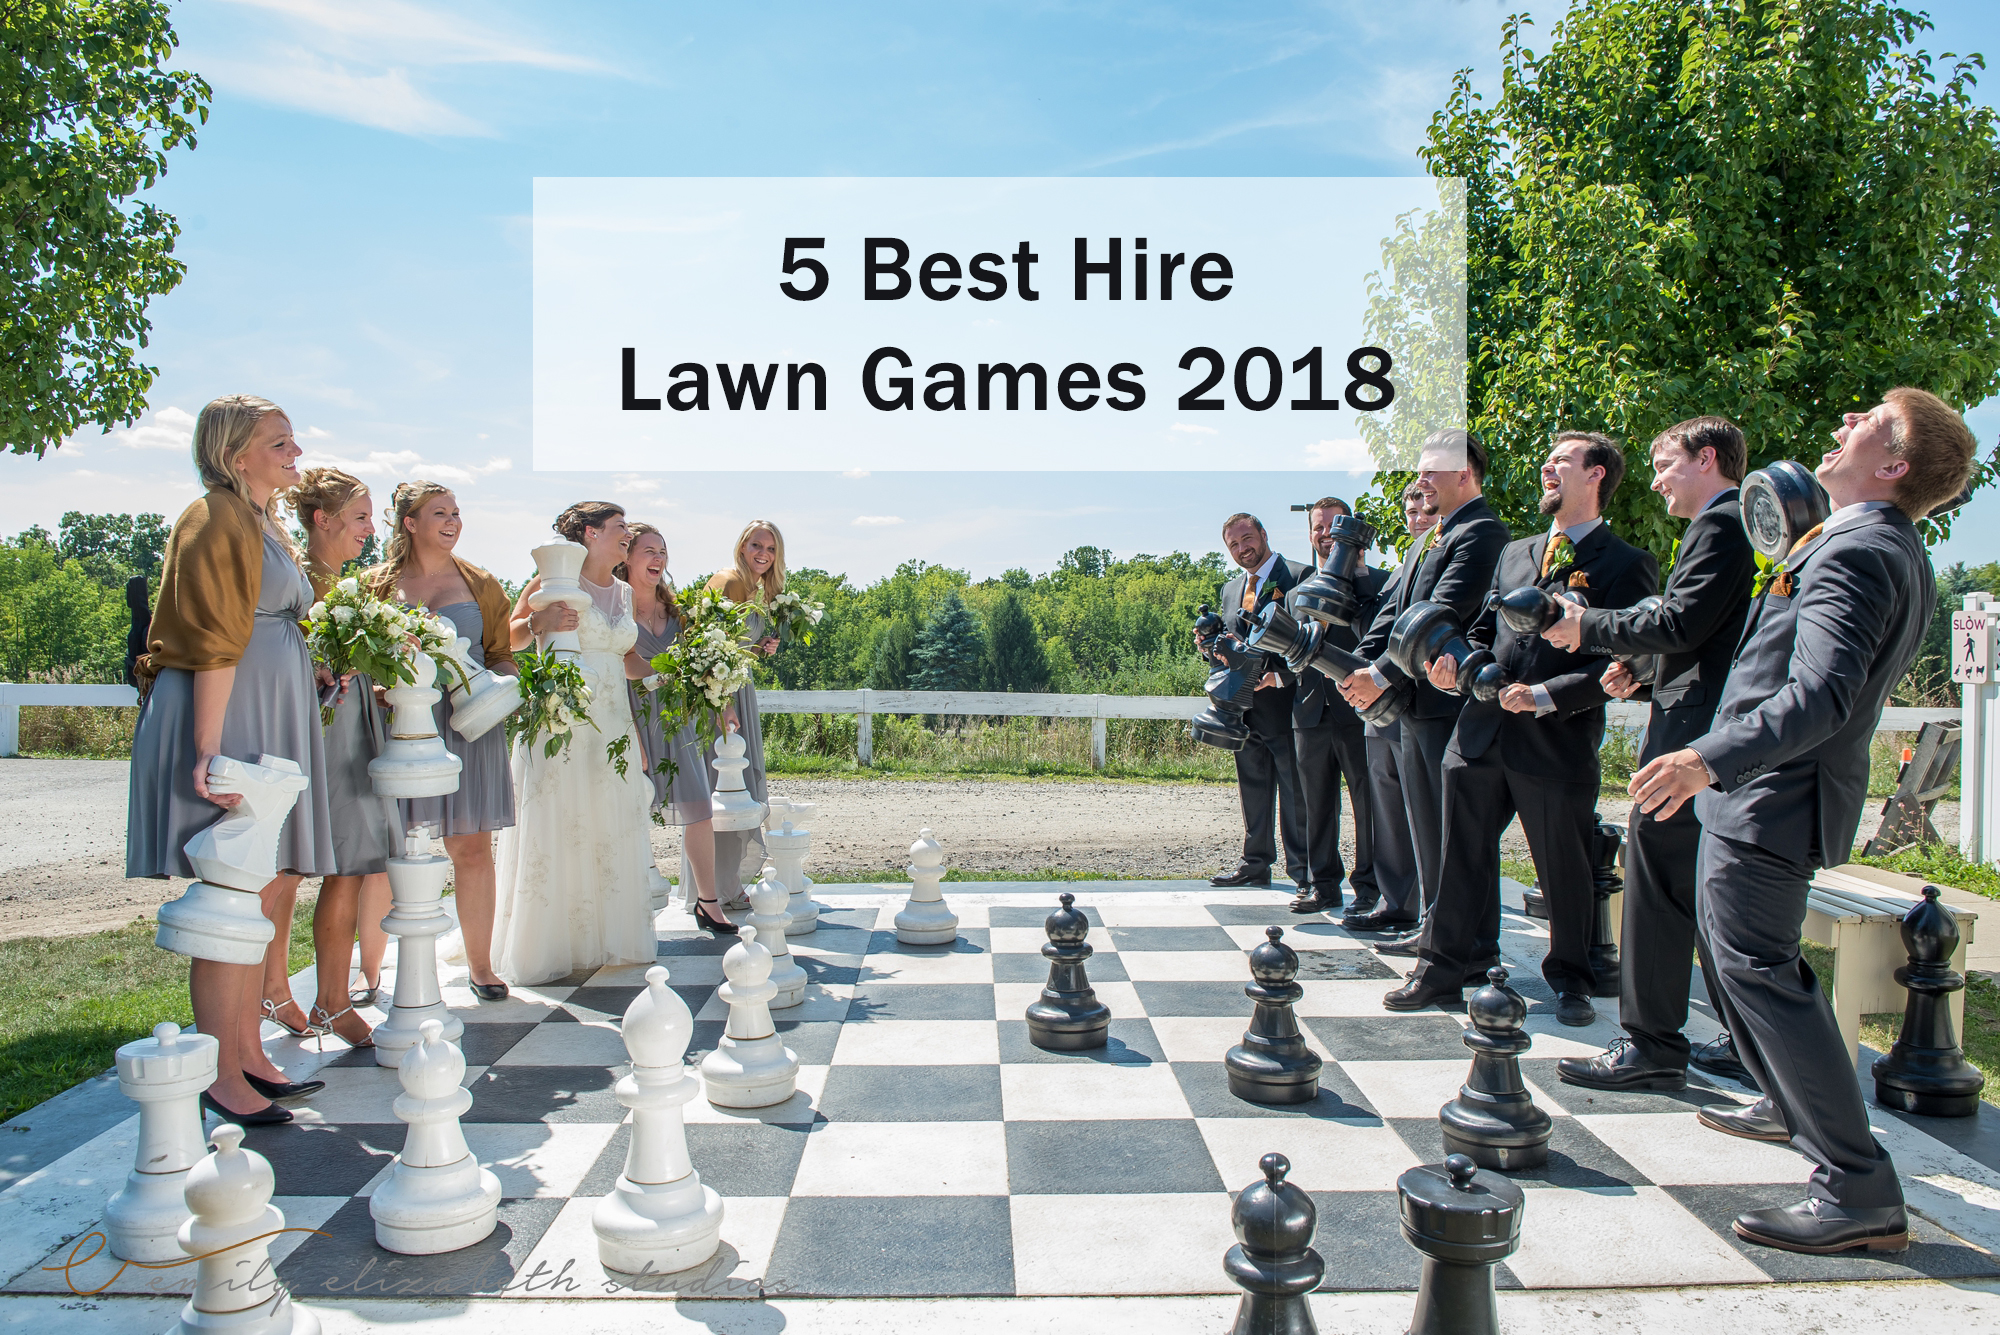 5 Best Hire Lawn Games 2018